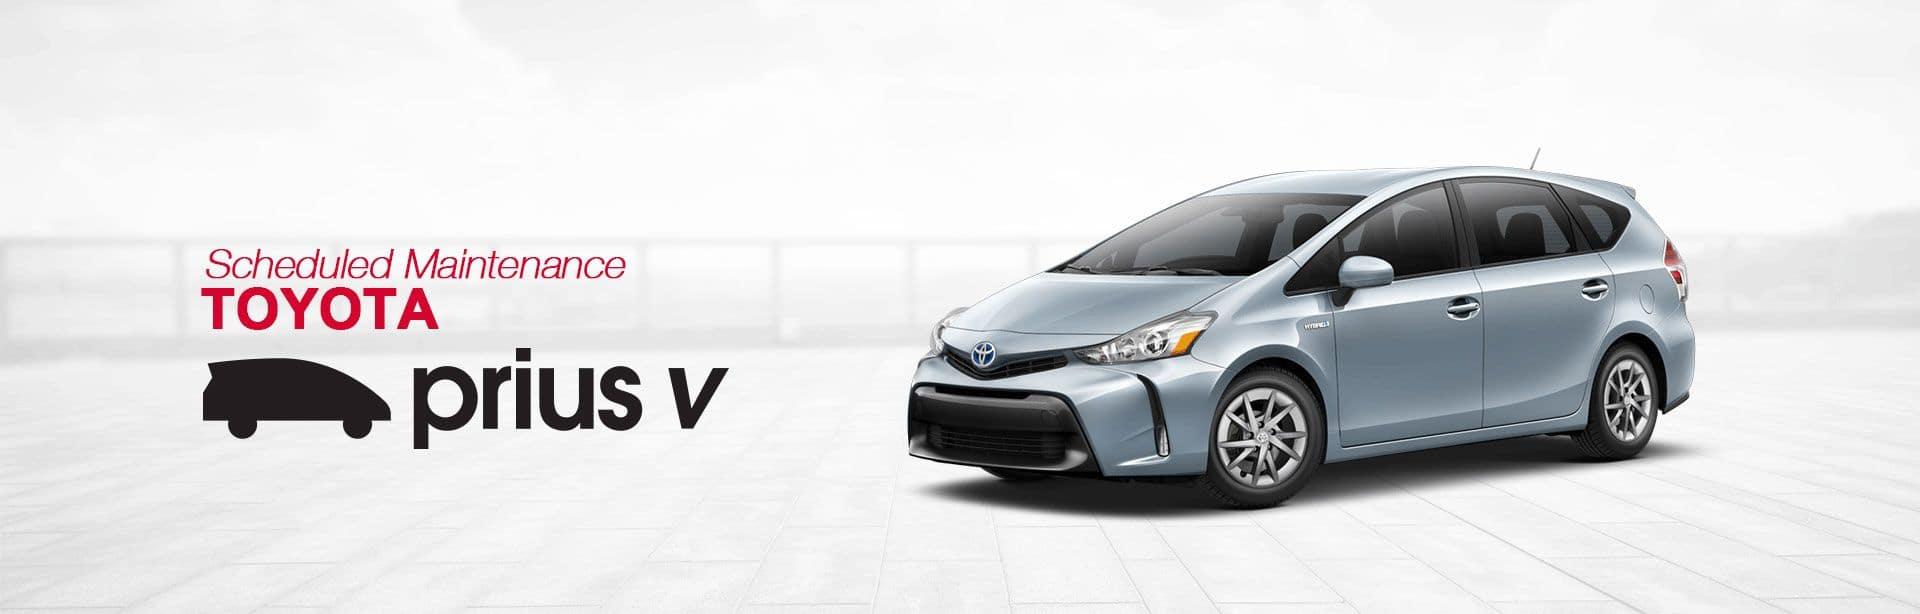 Toyota Prius v Scheduled Maintenance